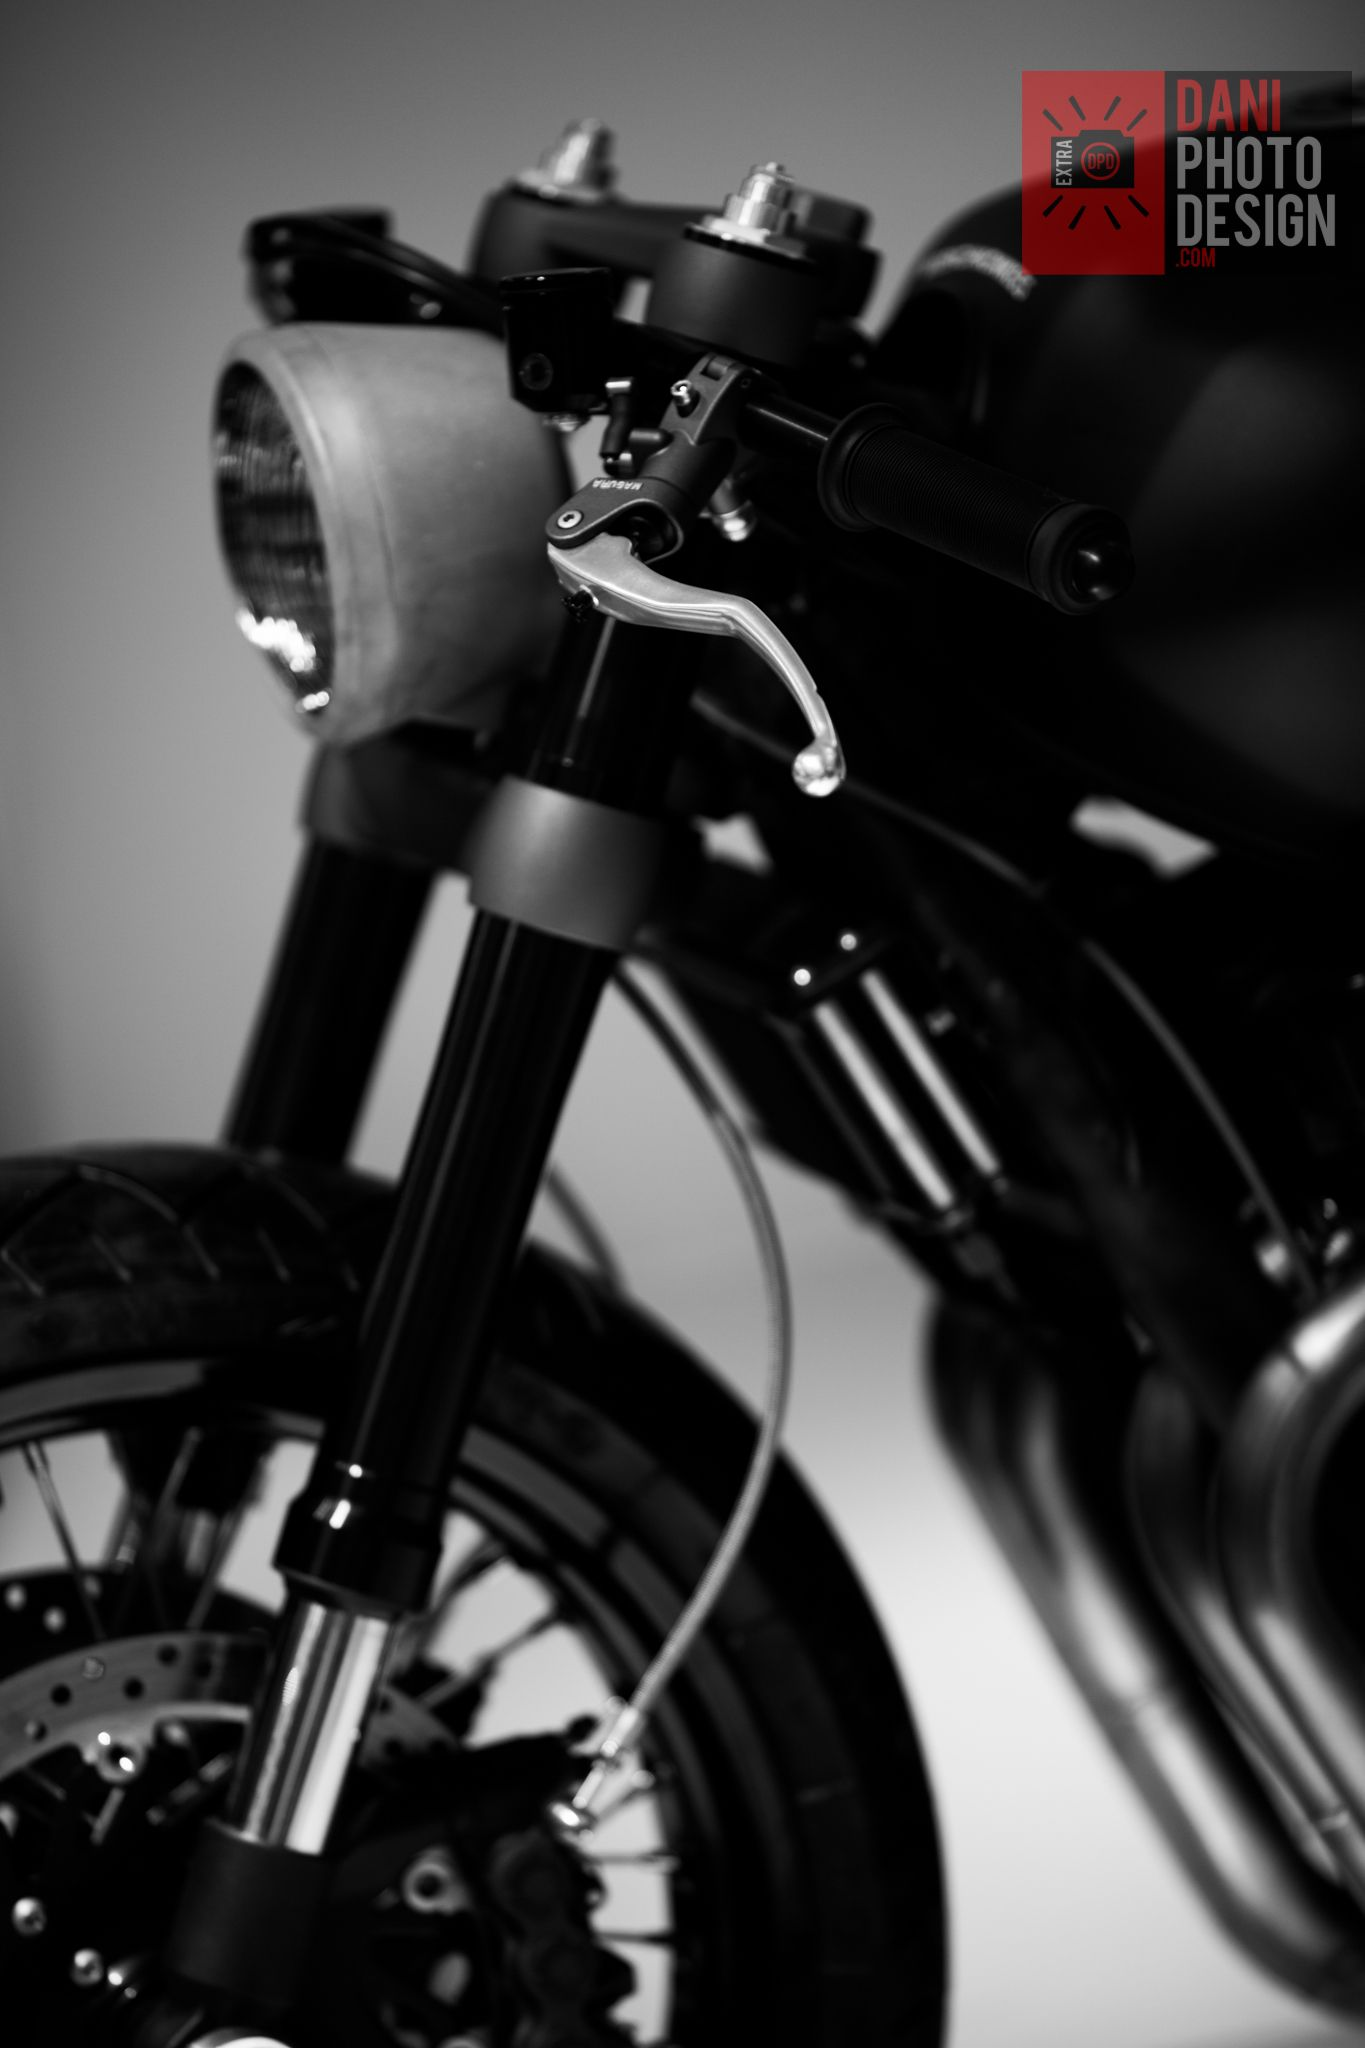 Motorcycles - daniphotodesign.com